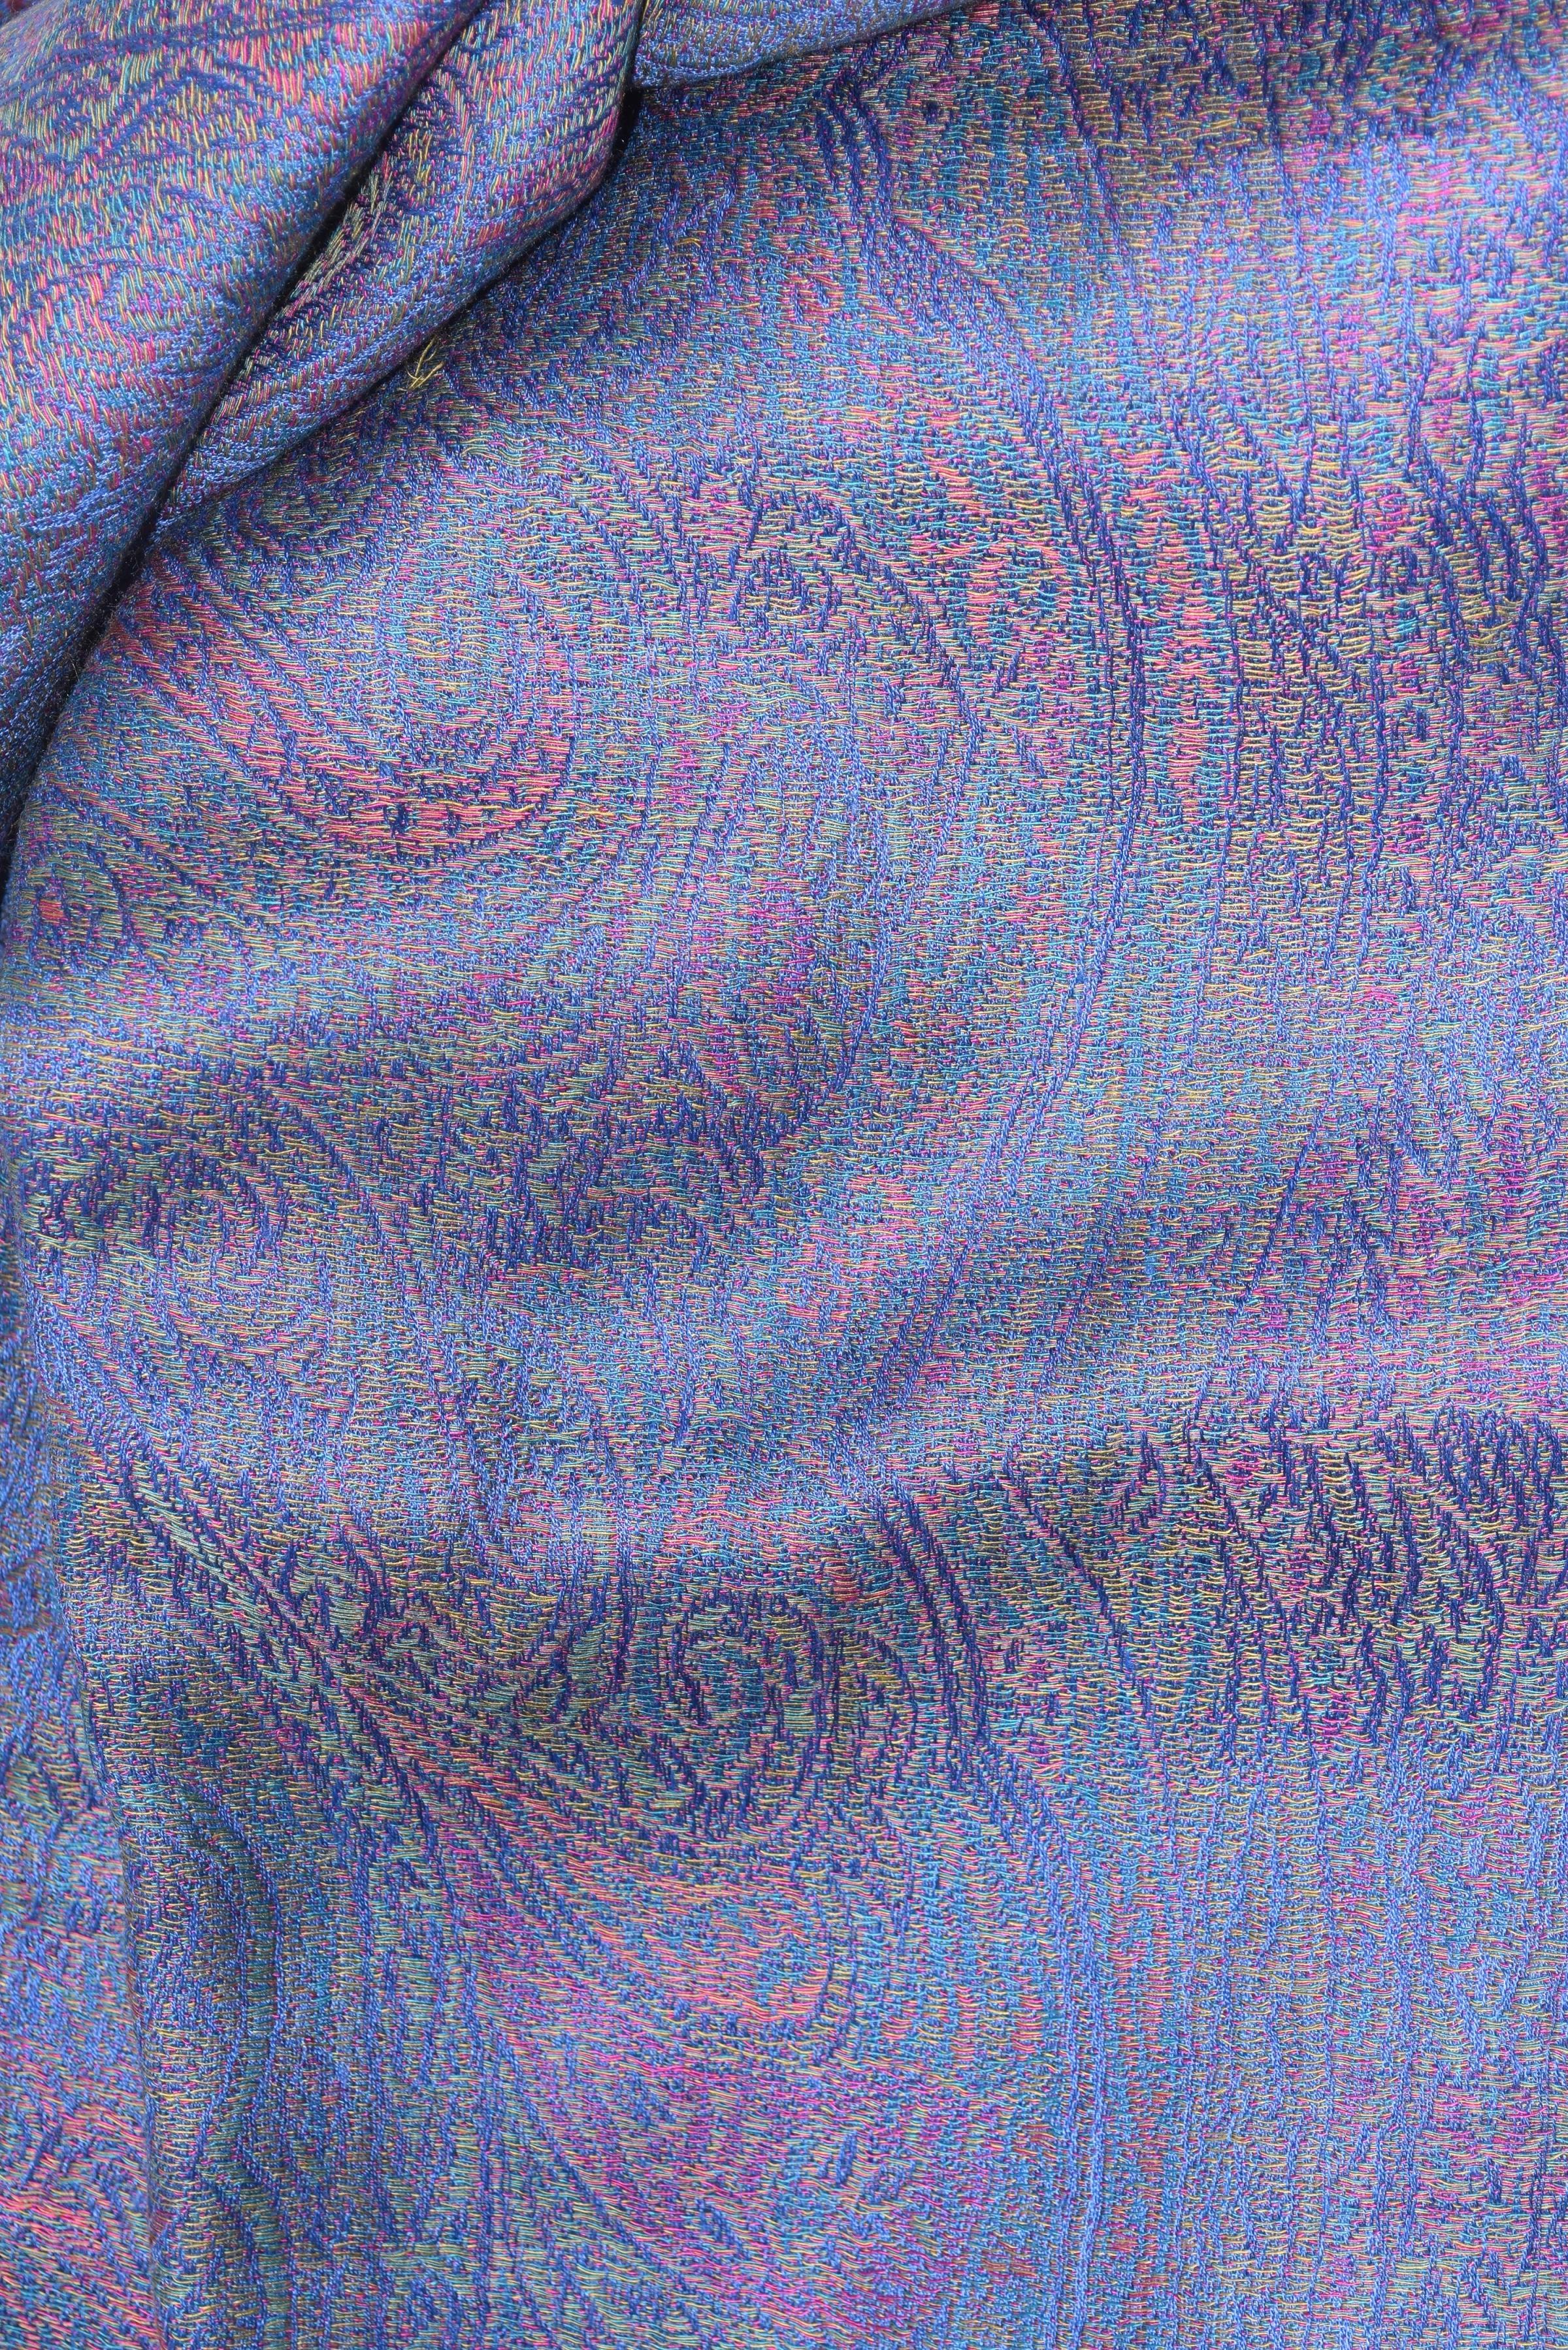 Large wool and silk Paisley shawl - Image 3 of 3